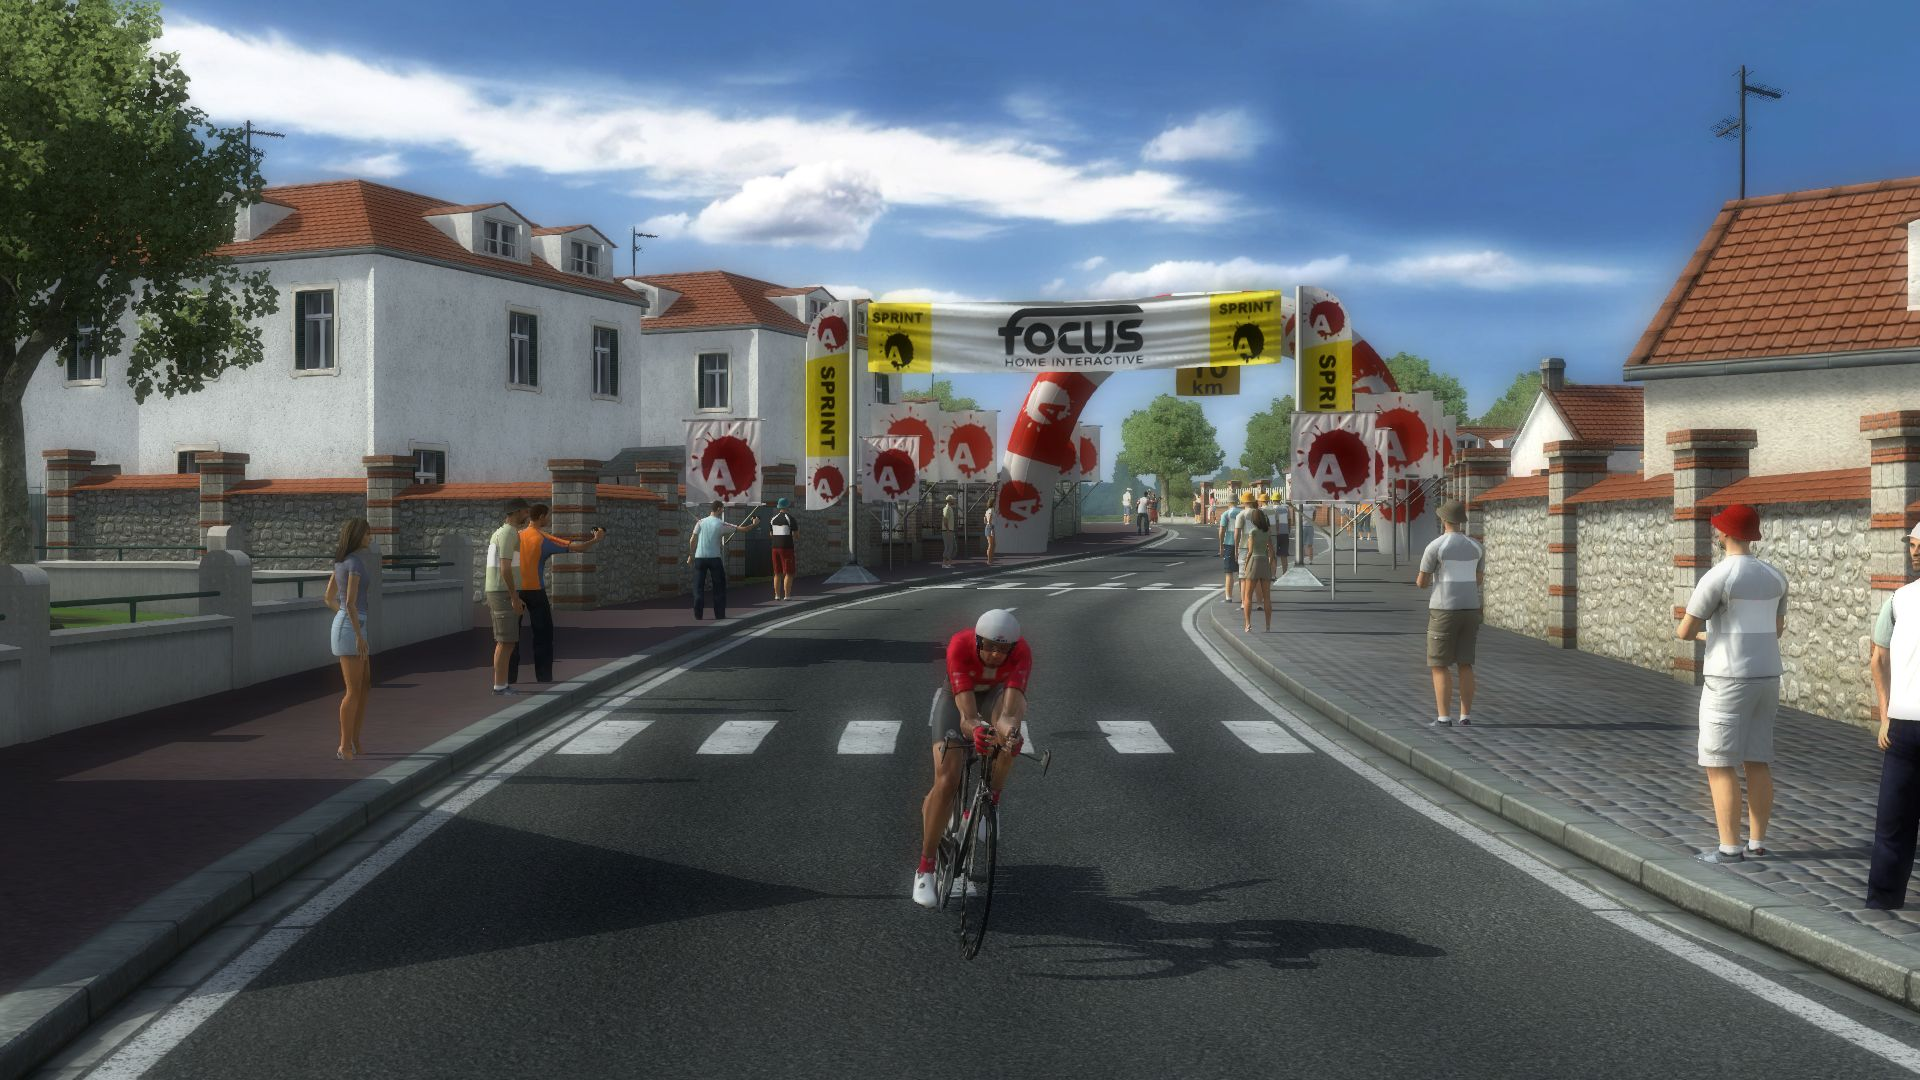 pcmdaily.com/images/mg/2019/Races/C1/Bayern/S4/mg19_bay_s04_23.jpg